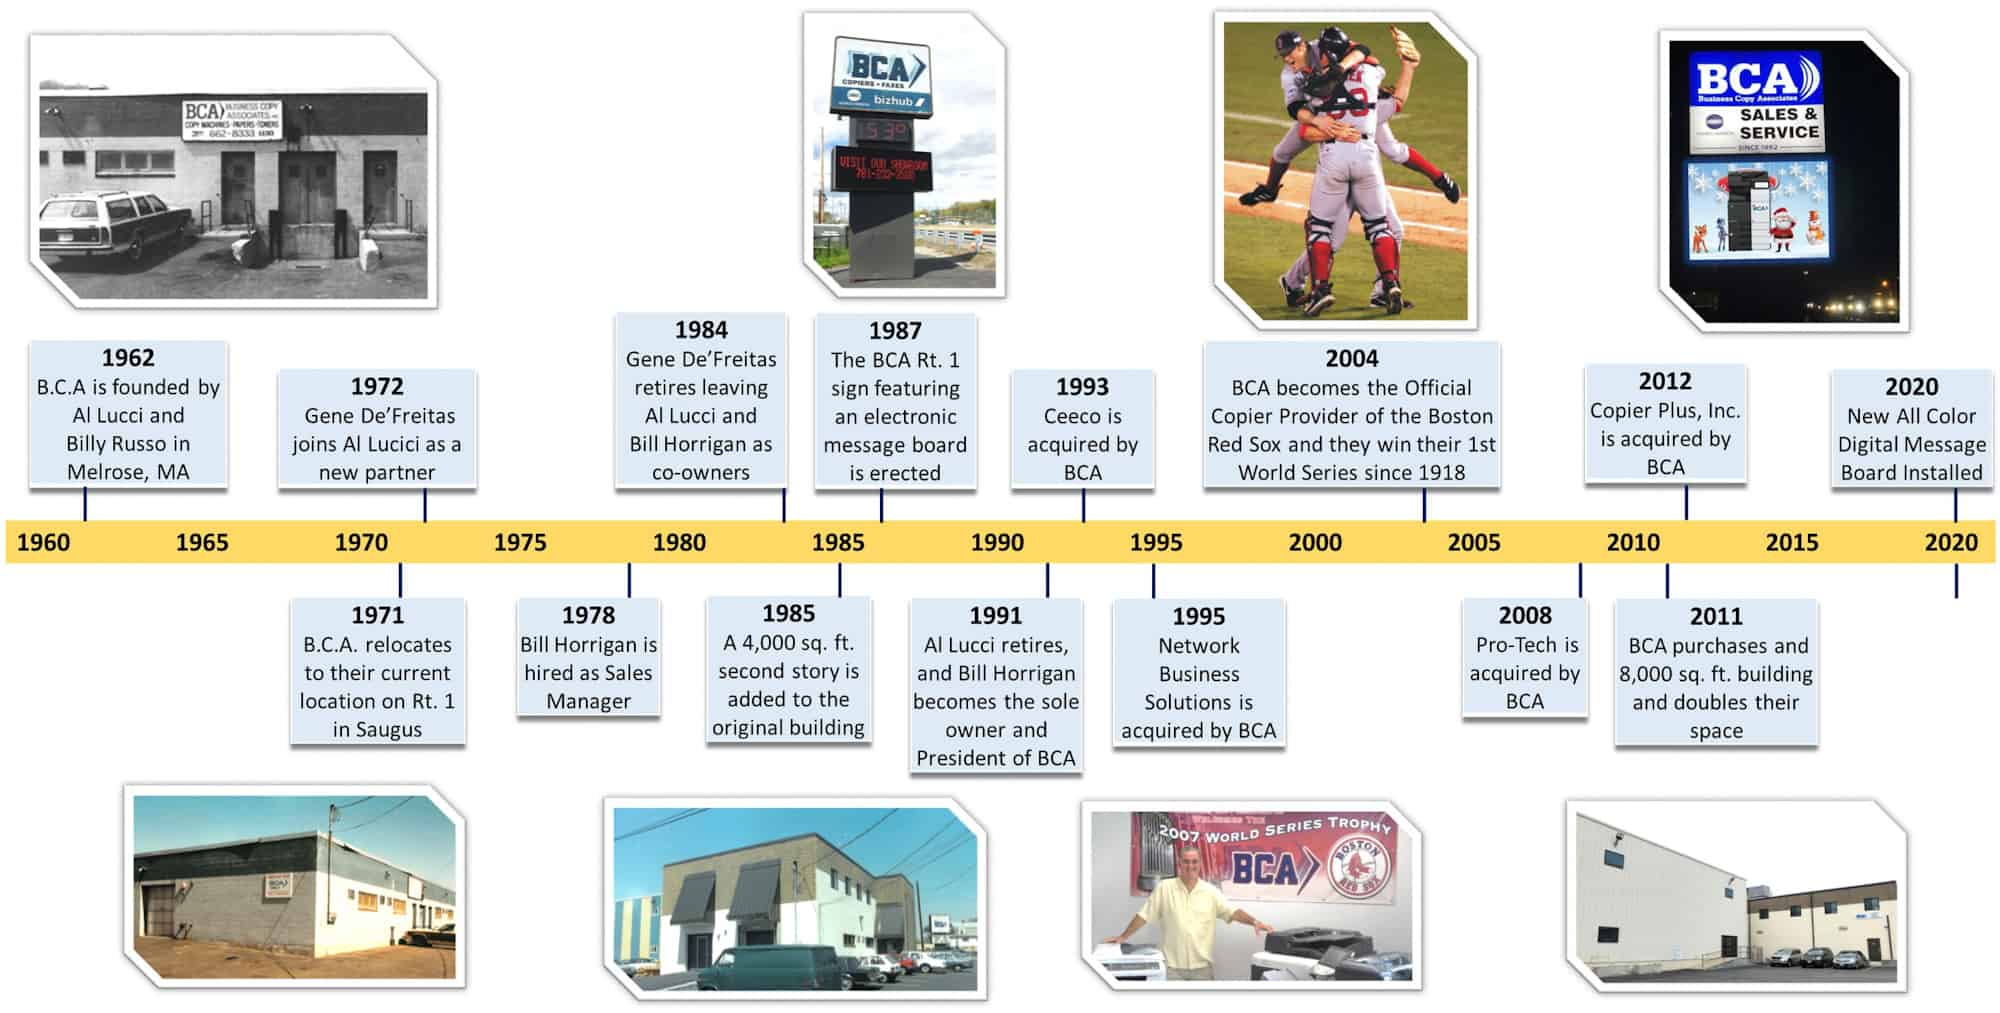 Business Copy Associates timeline